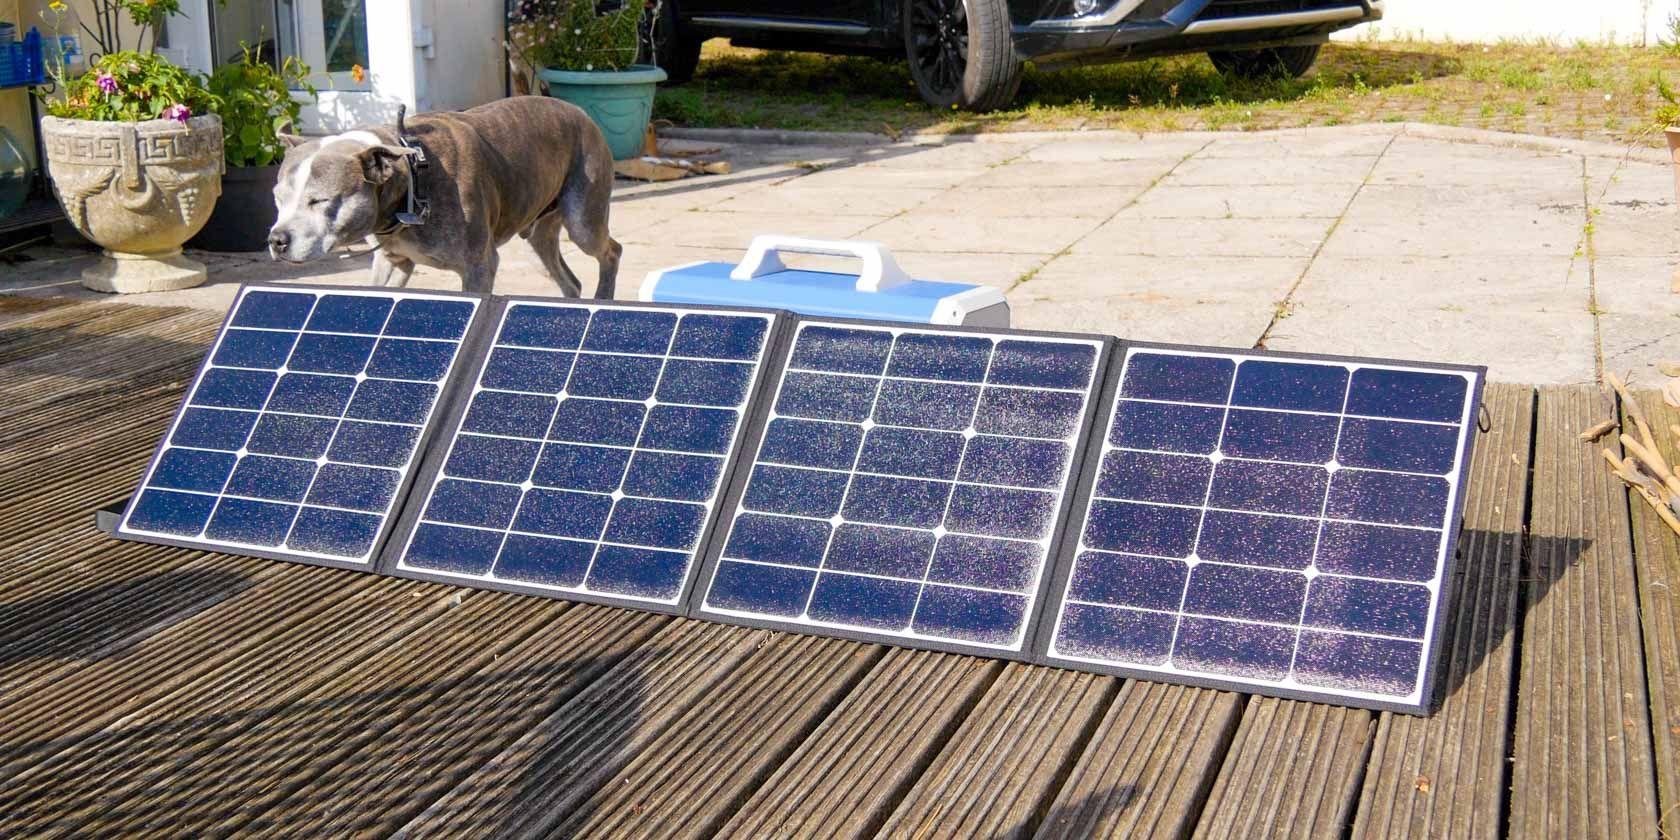 Portable, Powerful Solar Panel: Maxoak SP120 Review